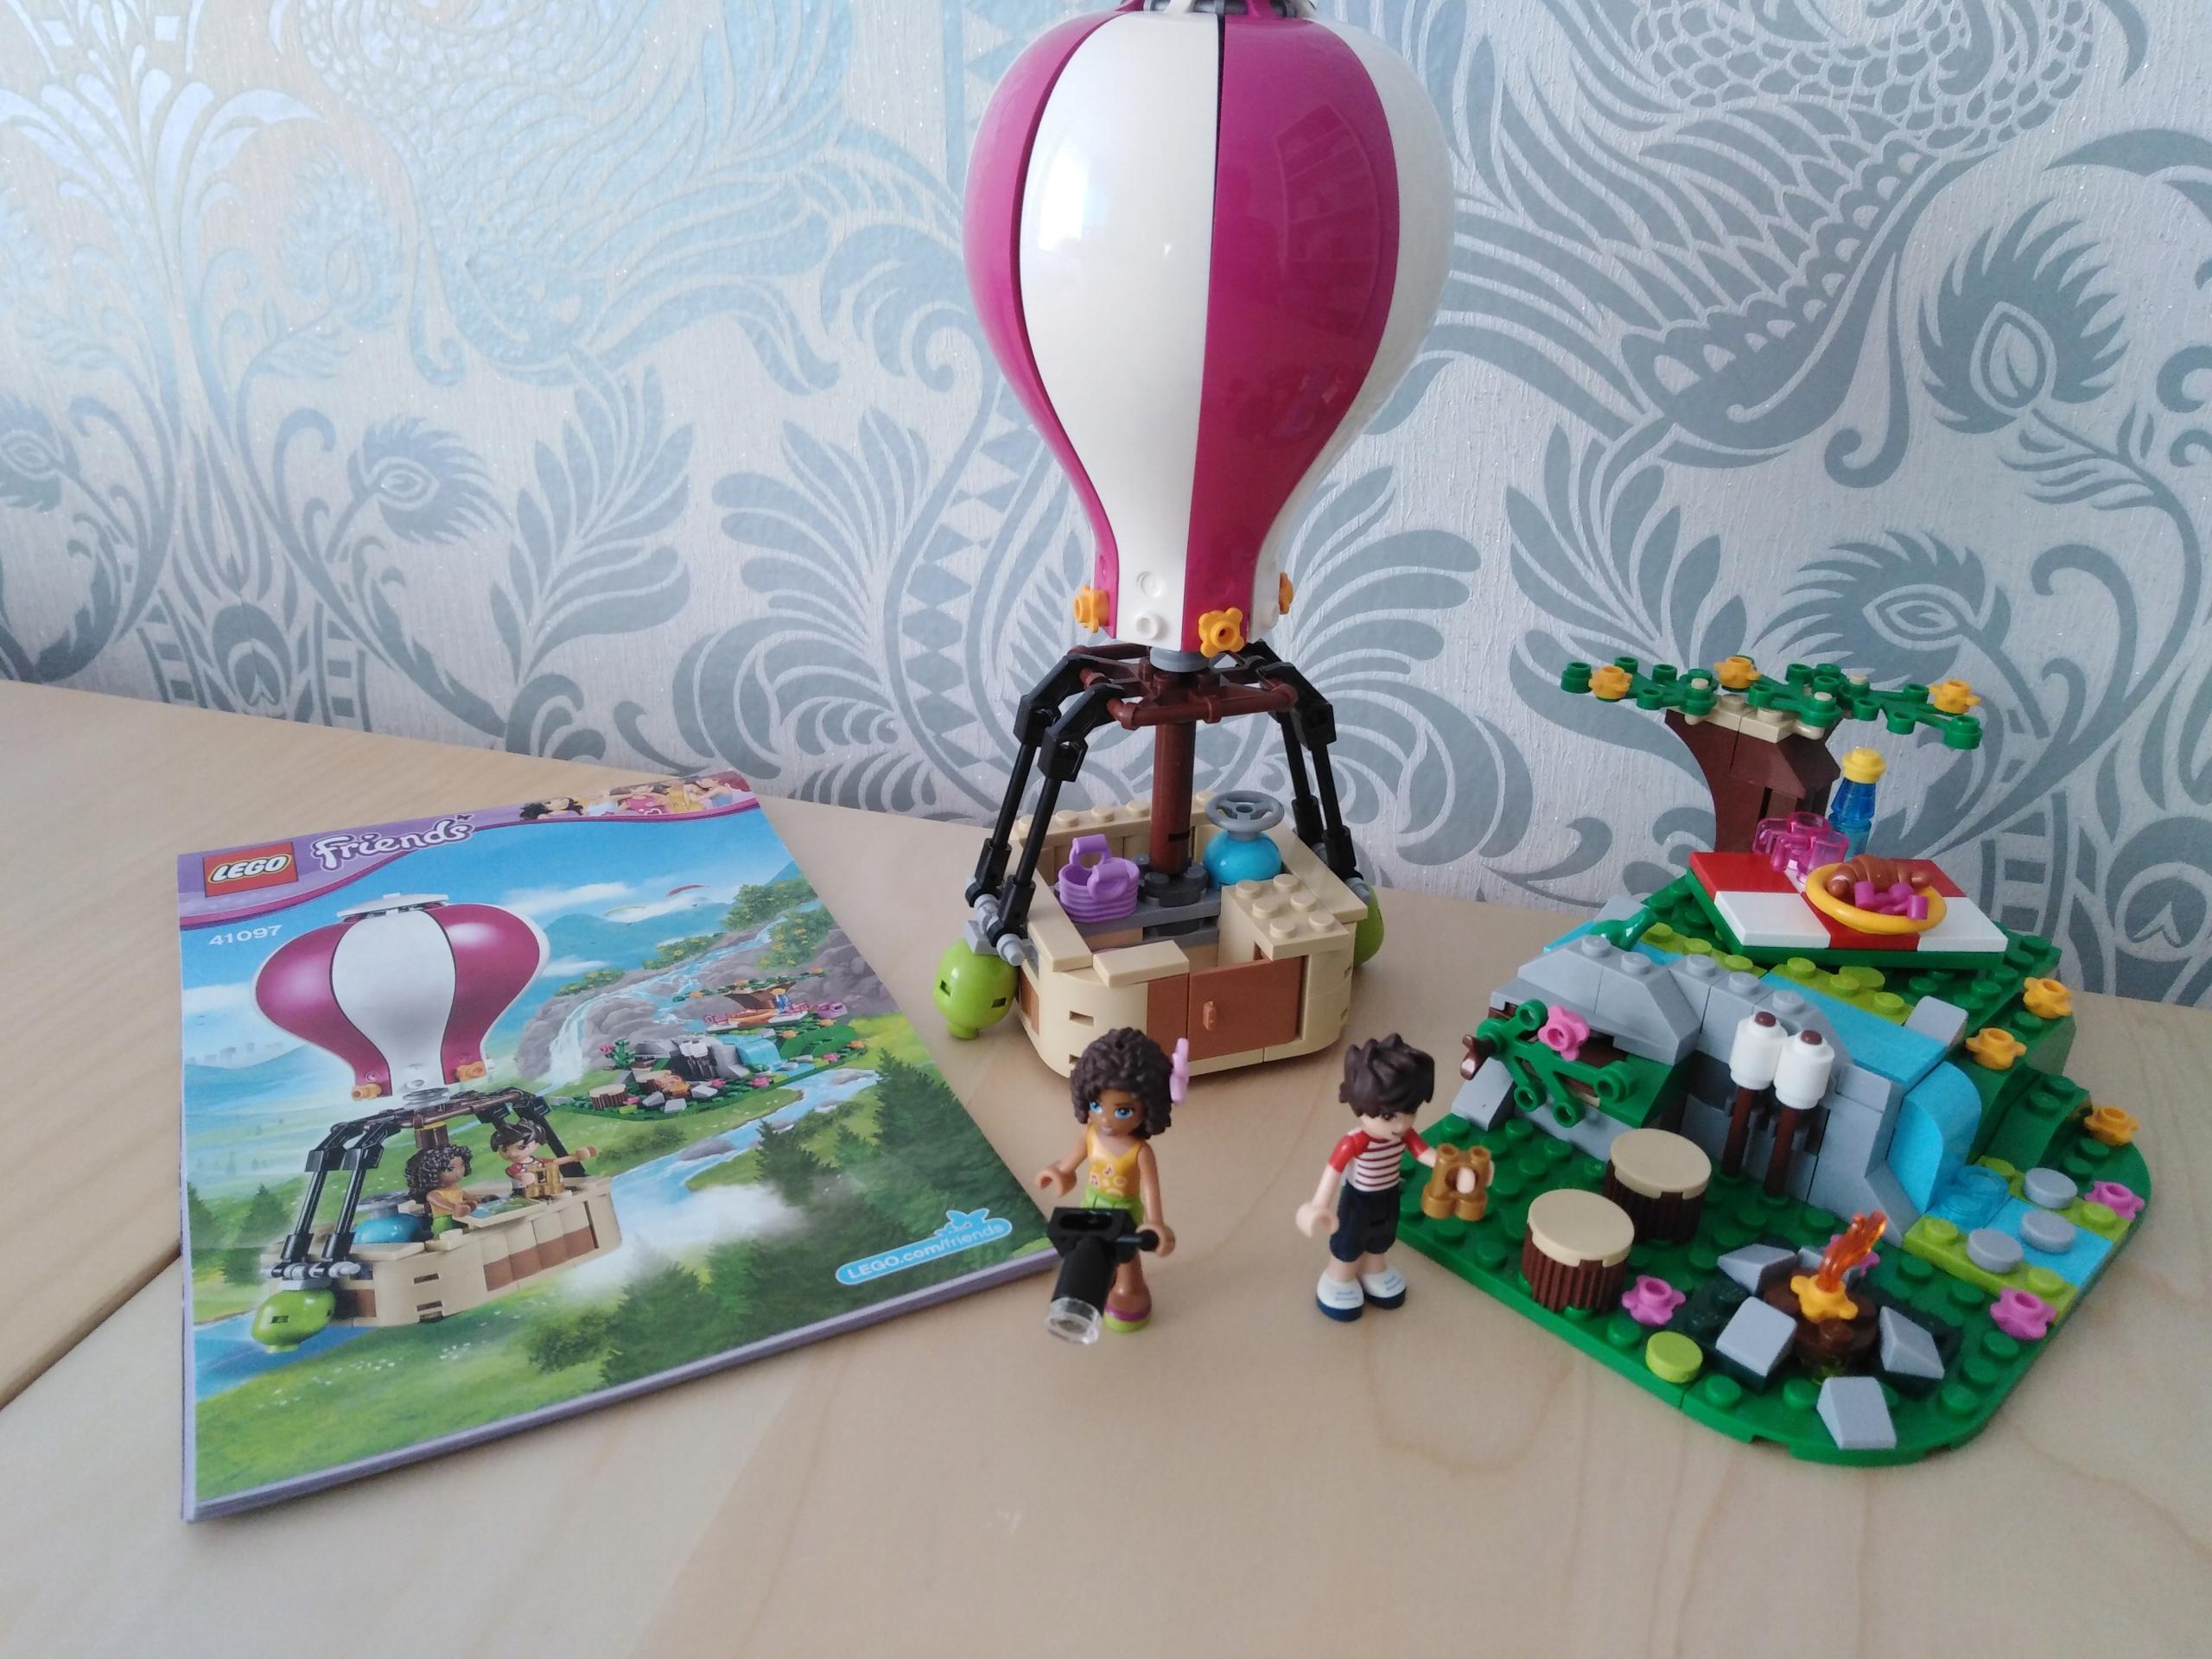 Lego Friends Balon 7646579517 Oficjalne Archiwum Allegro